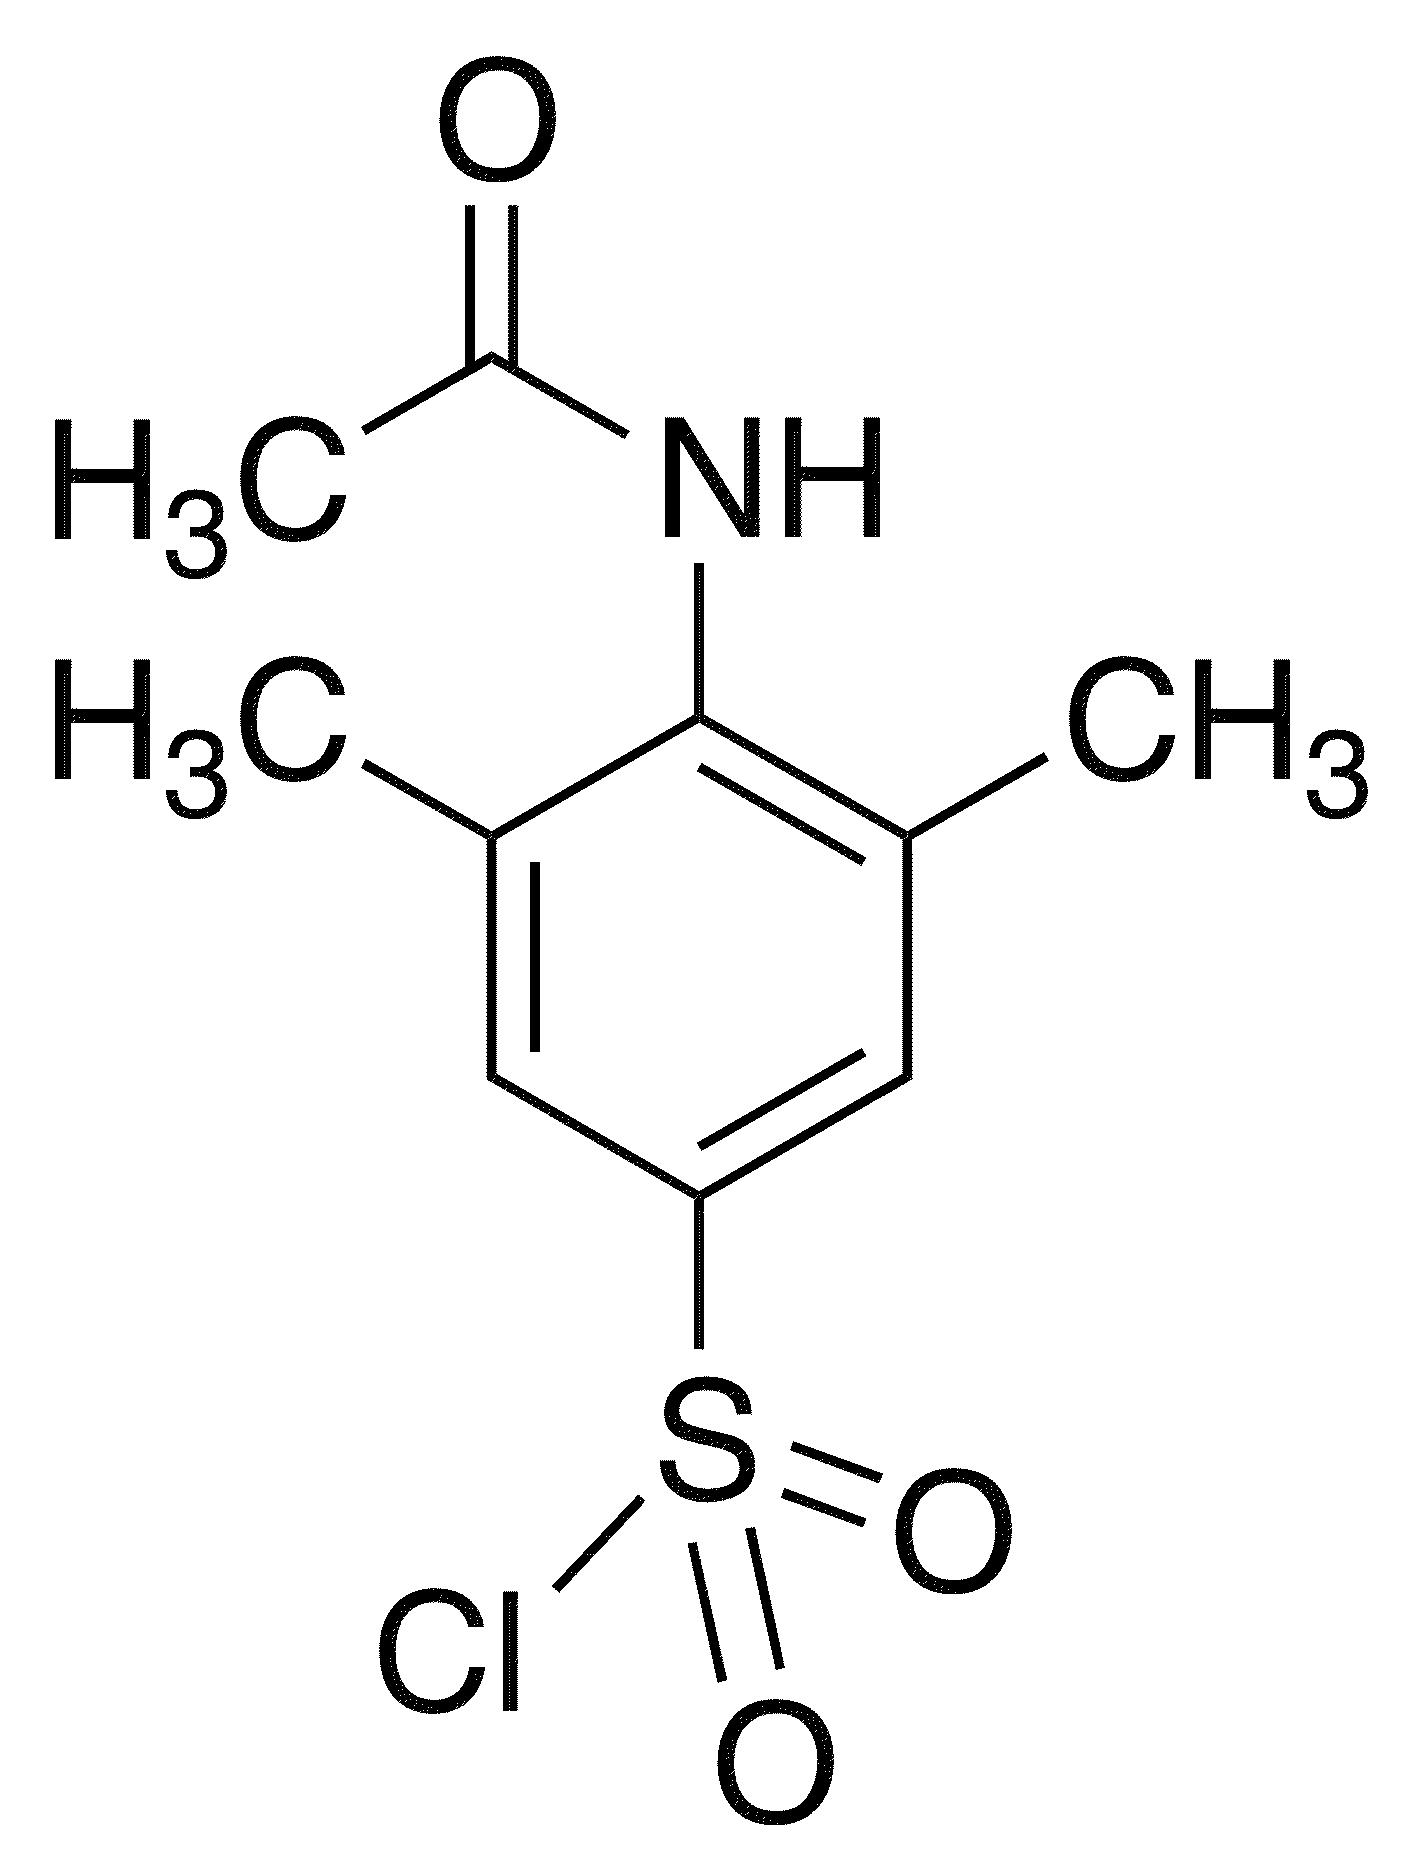 4-Acetamido-3,5-dimethylbenzene-1-sulfonyl chloride